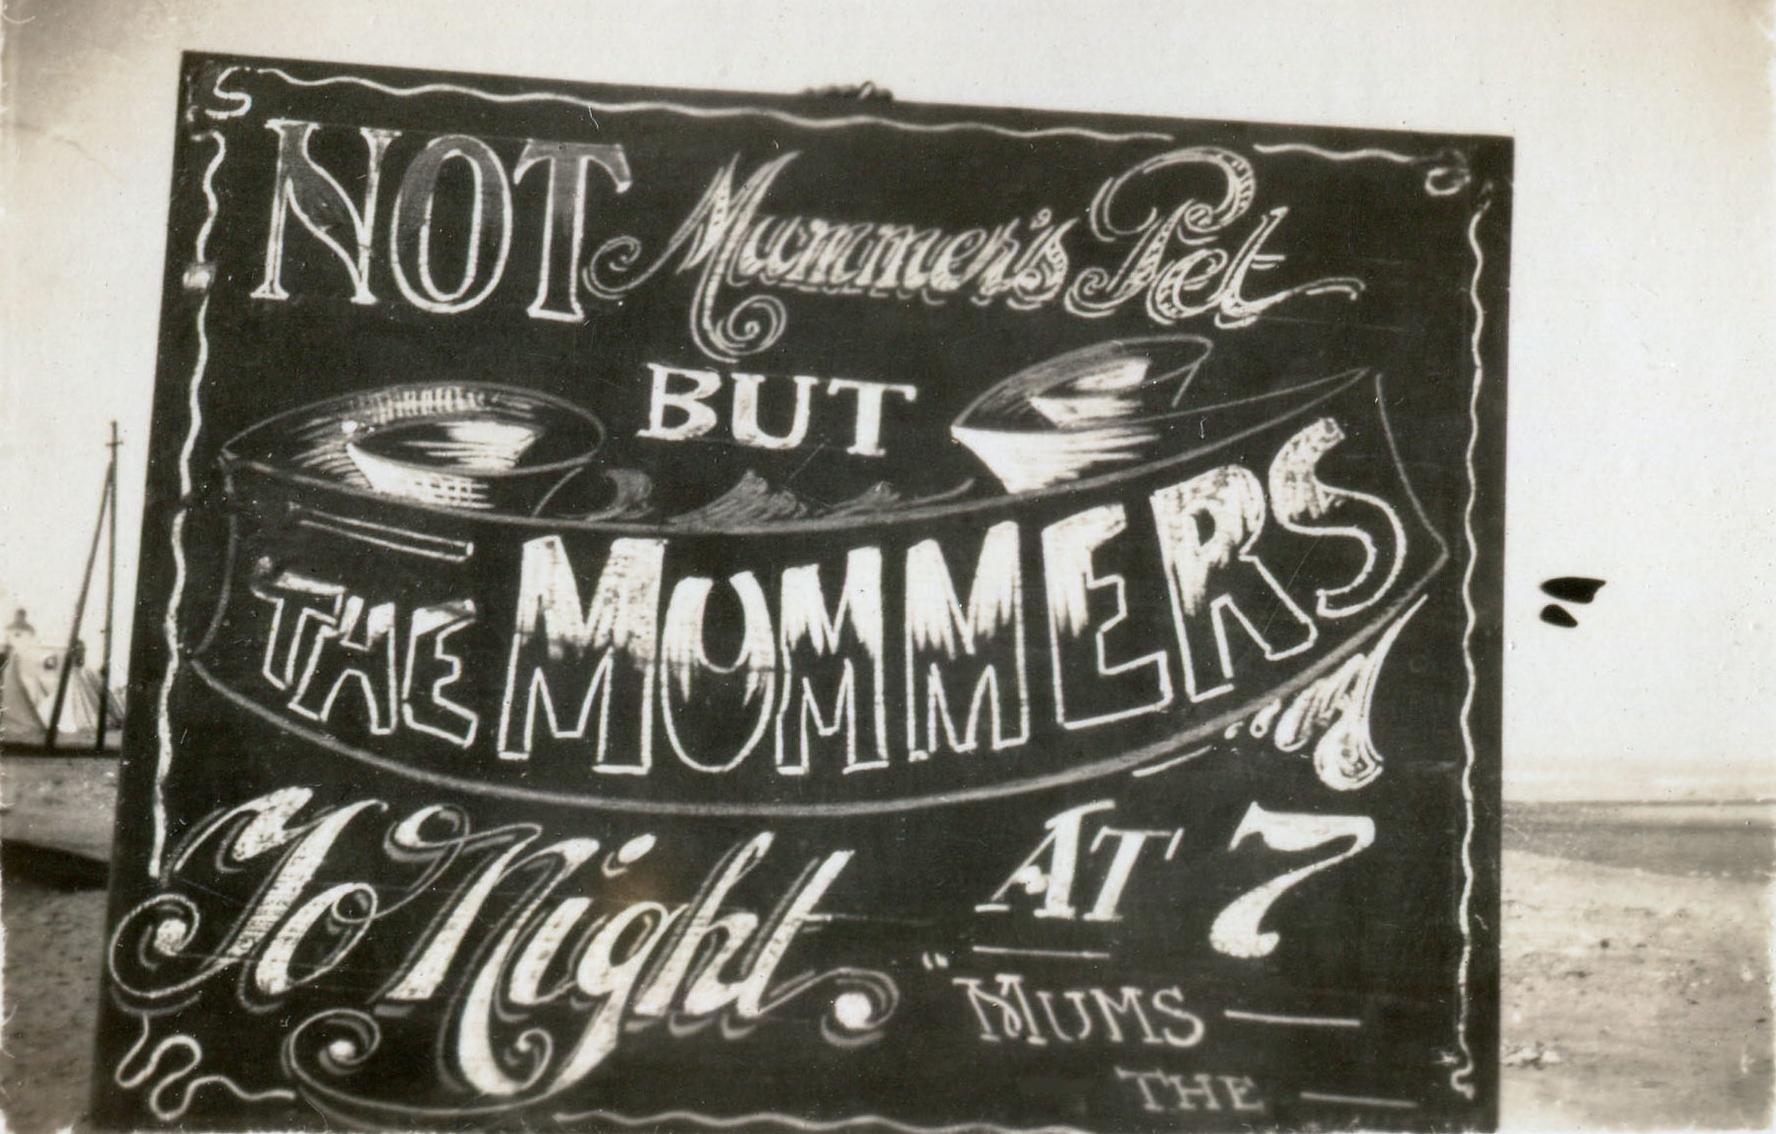 reg walters089 The Mummers.jpg